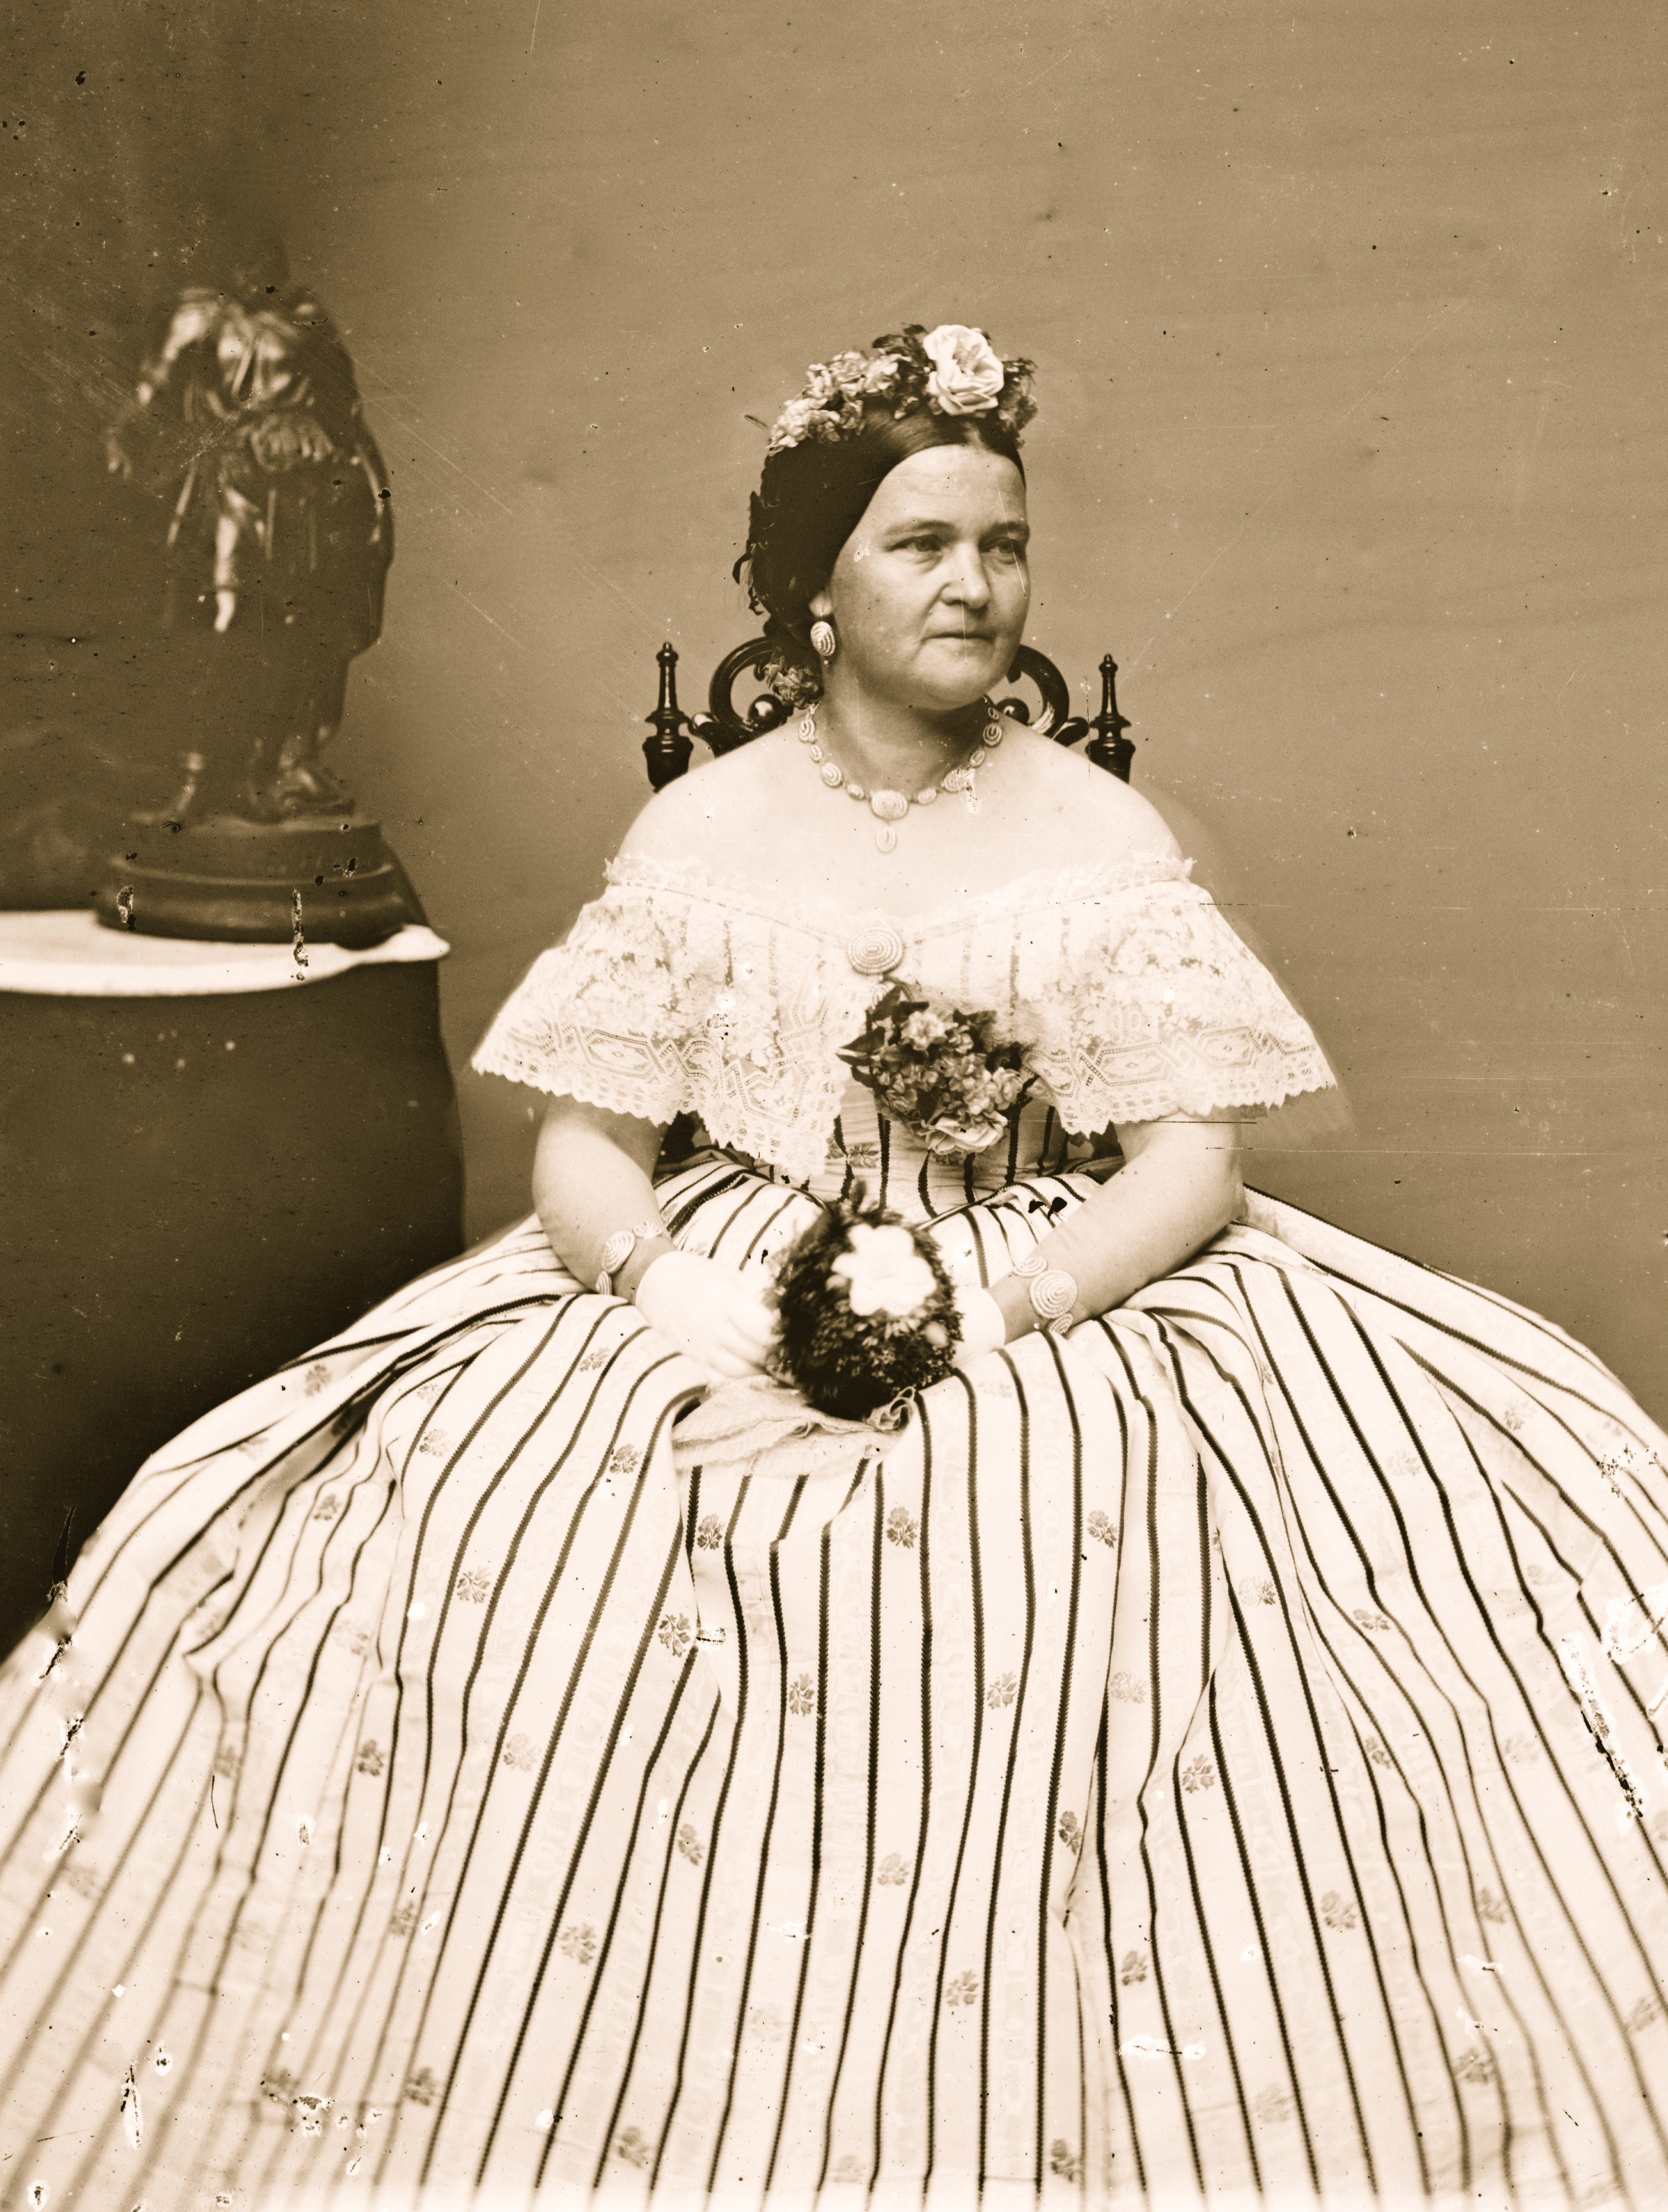 Dressmaking Led Elizabeth Keckley From Slavery to the ...